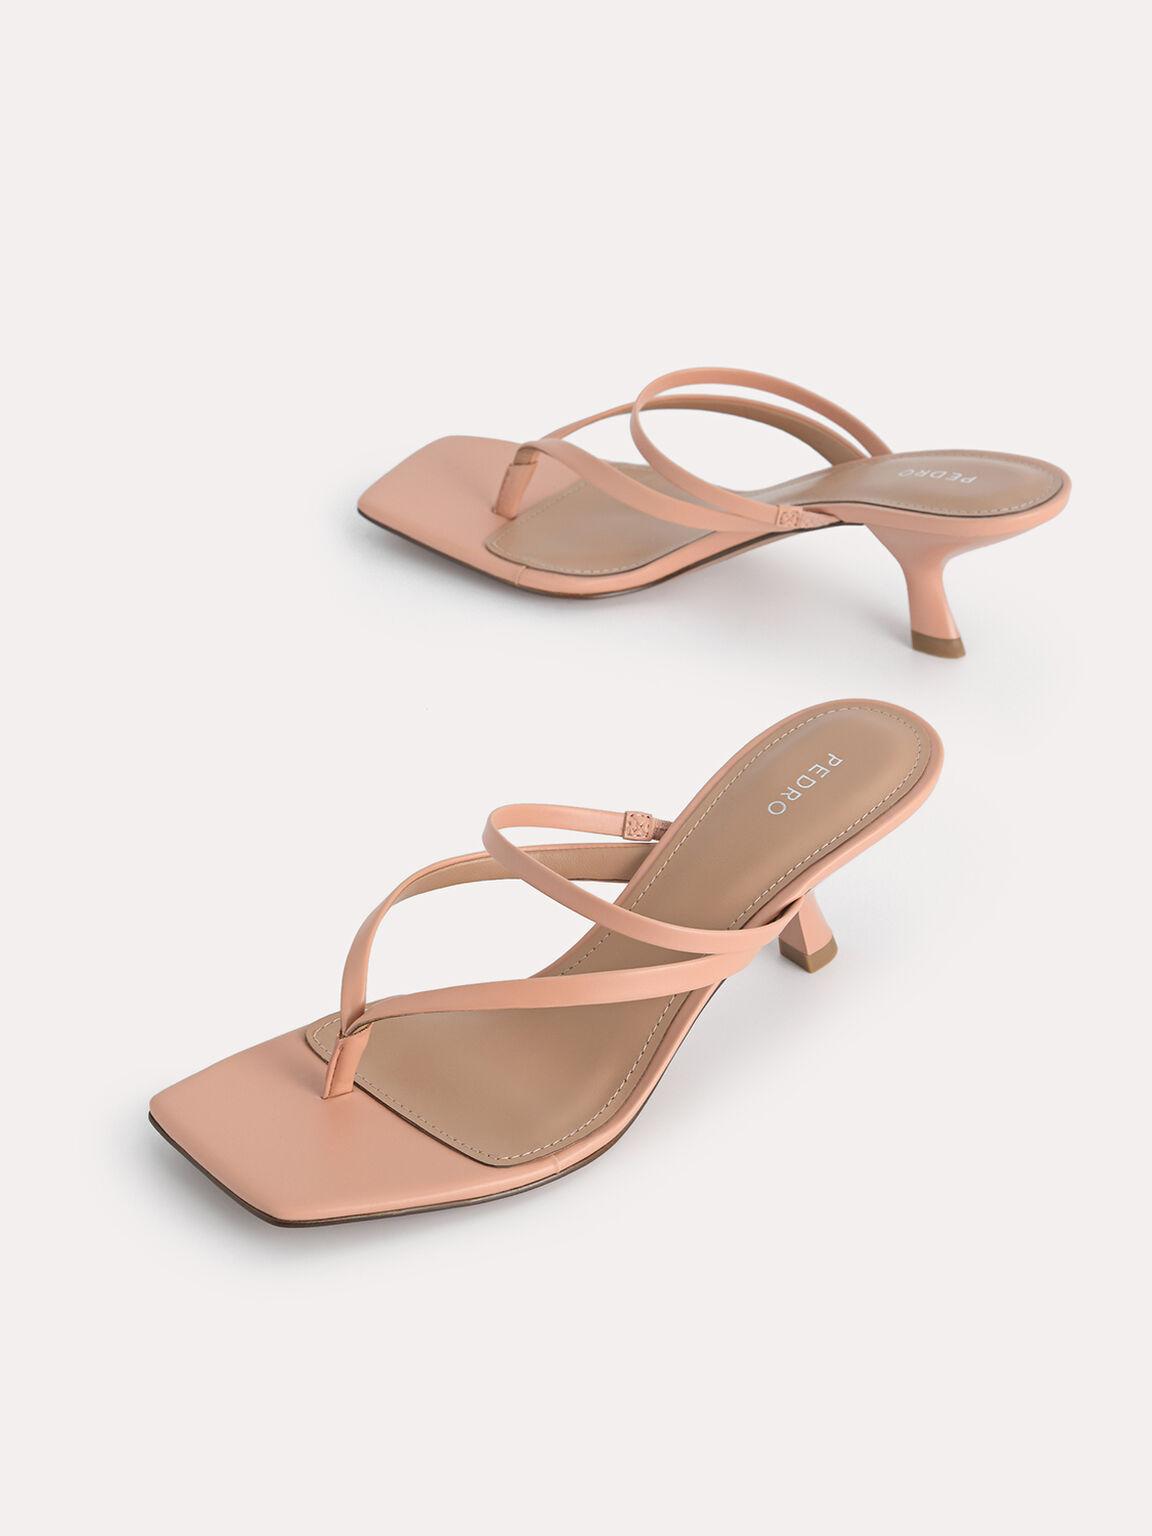 Thong Heeled Sandals, Nude, hi-res